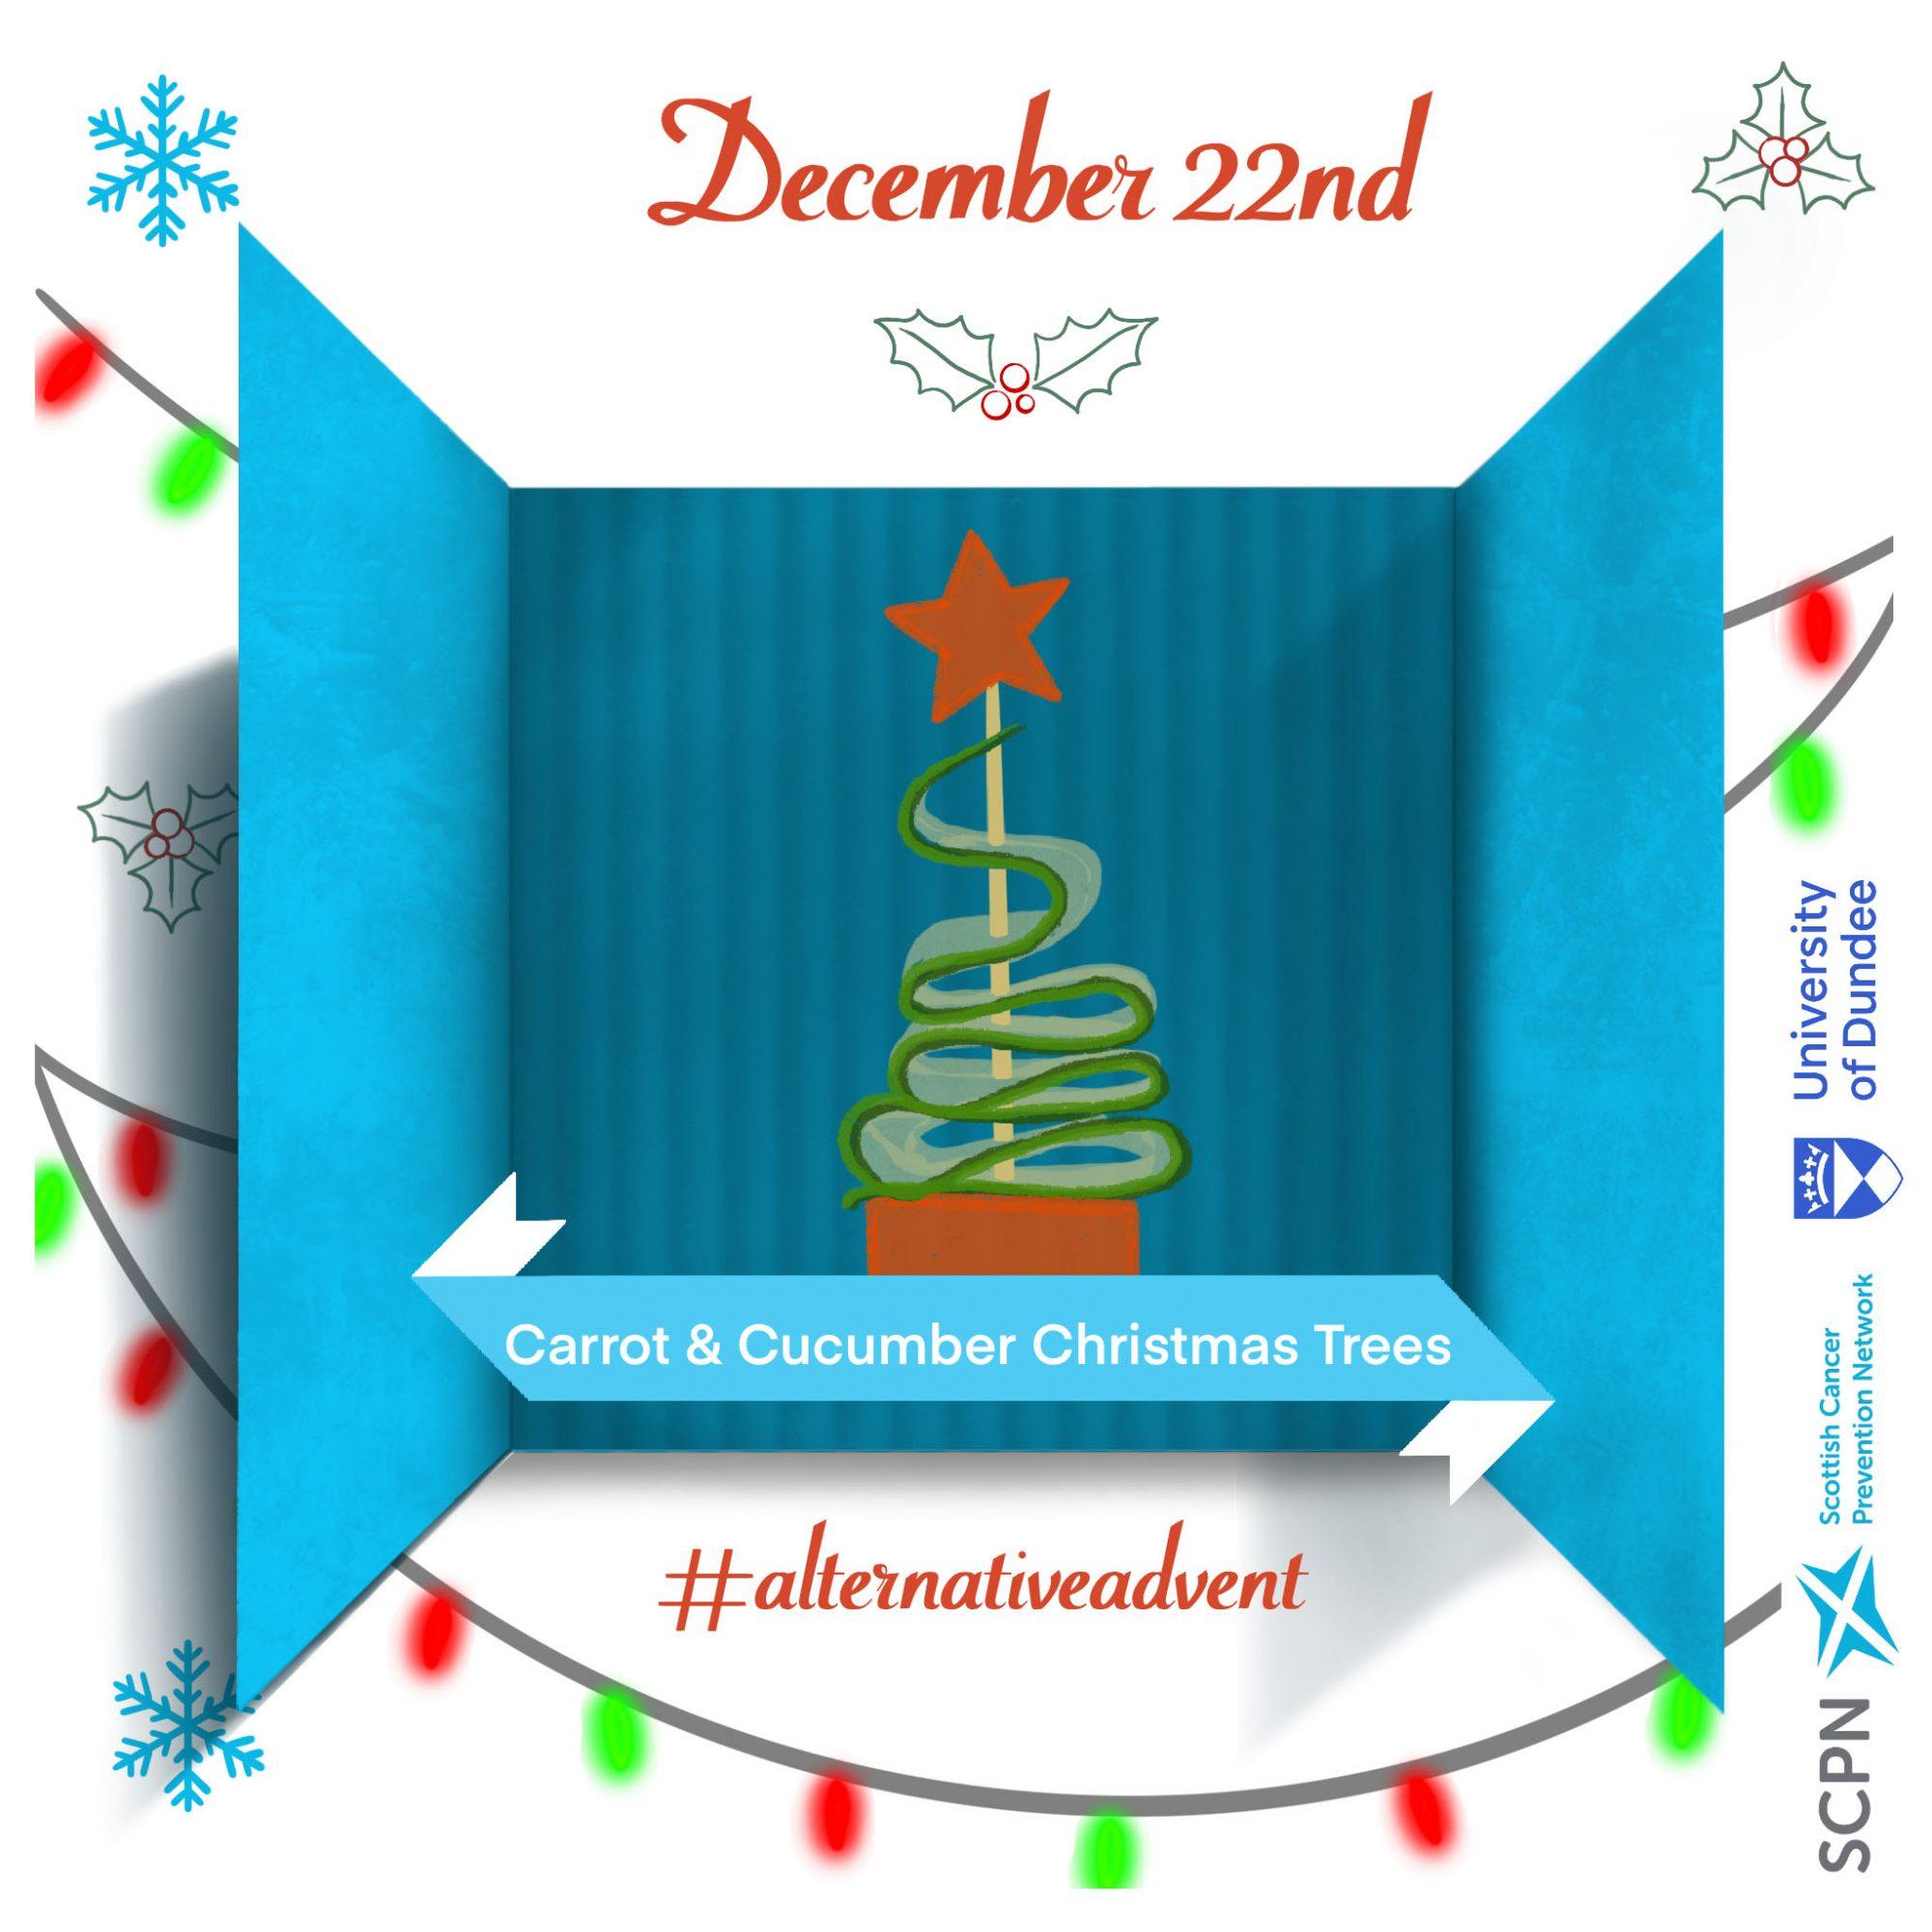 Dec 22